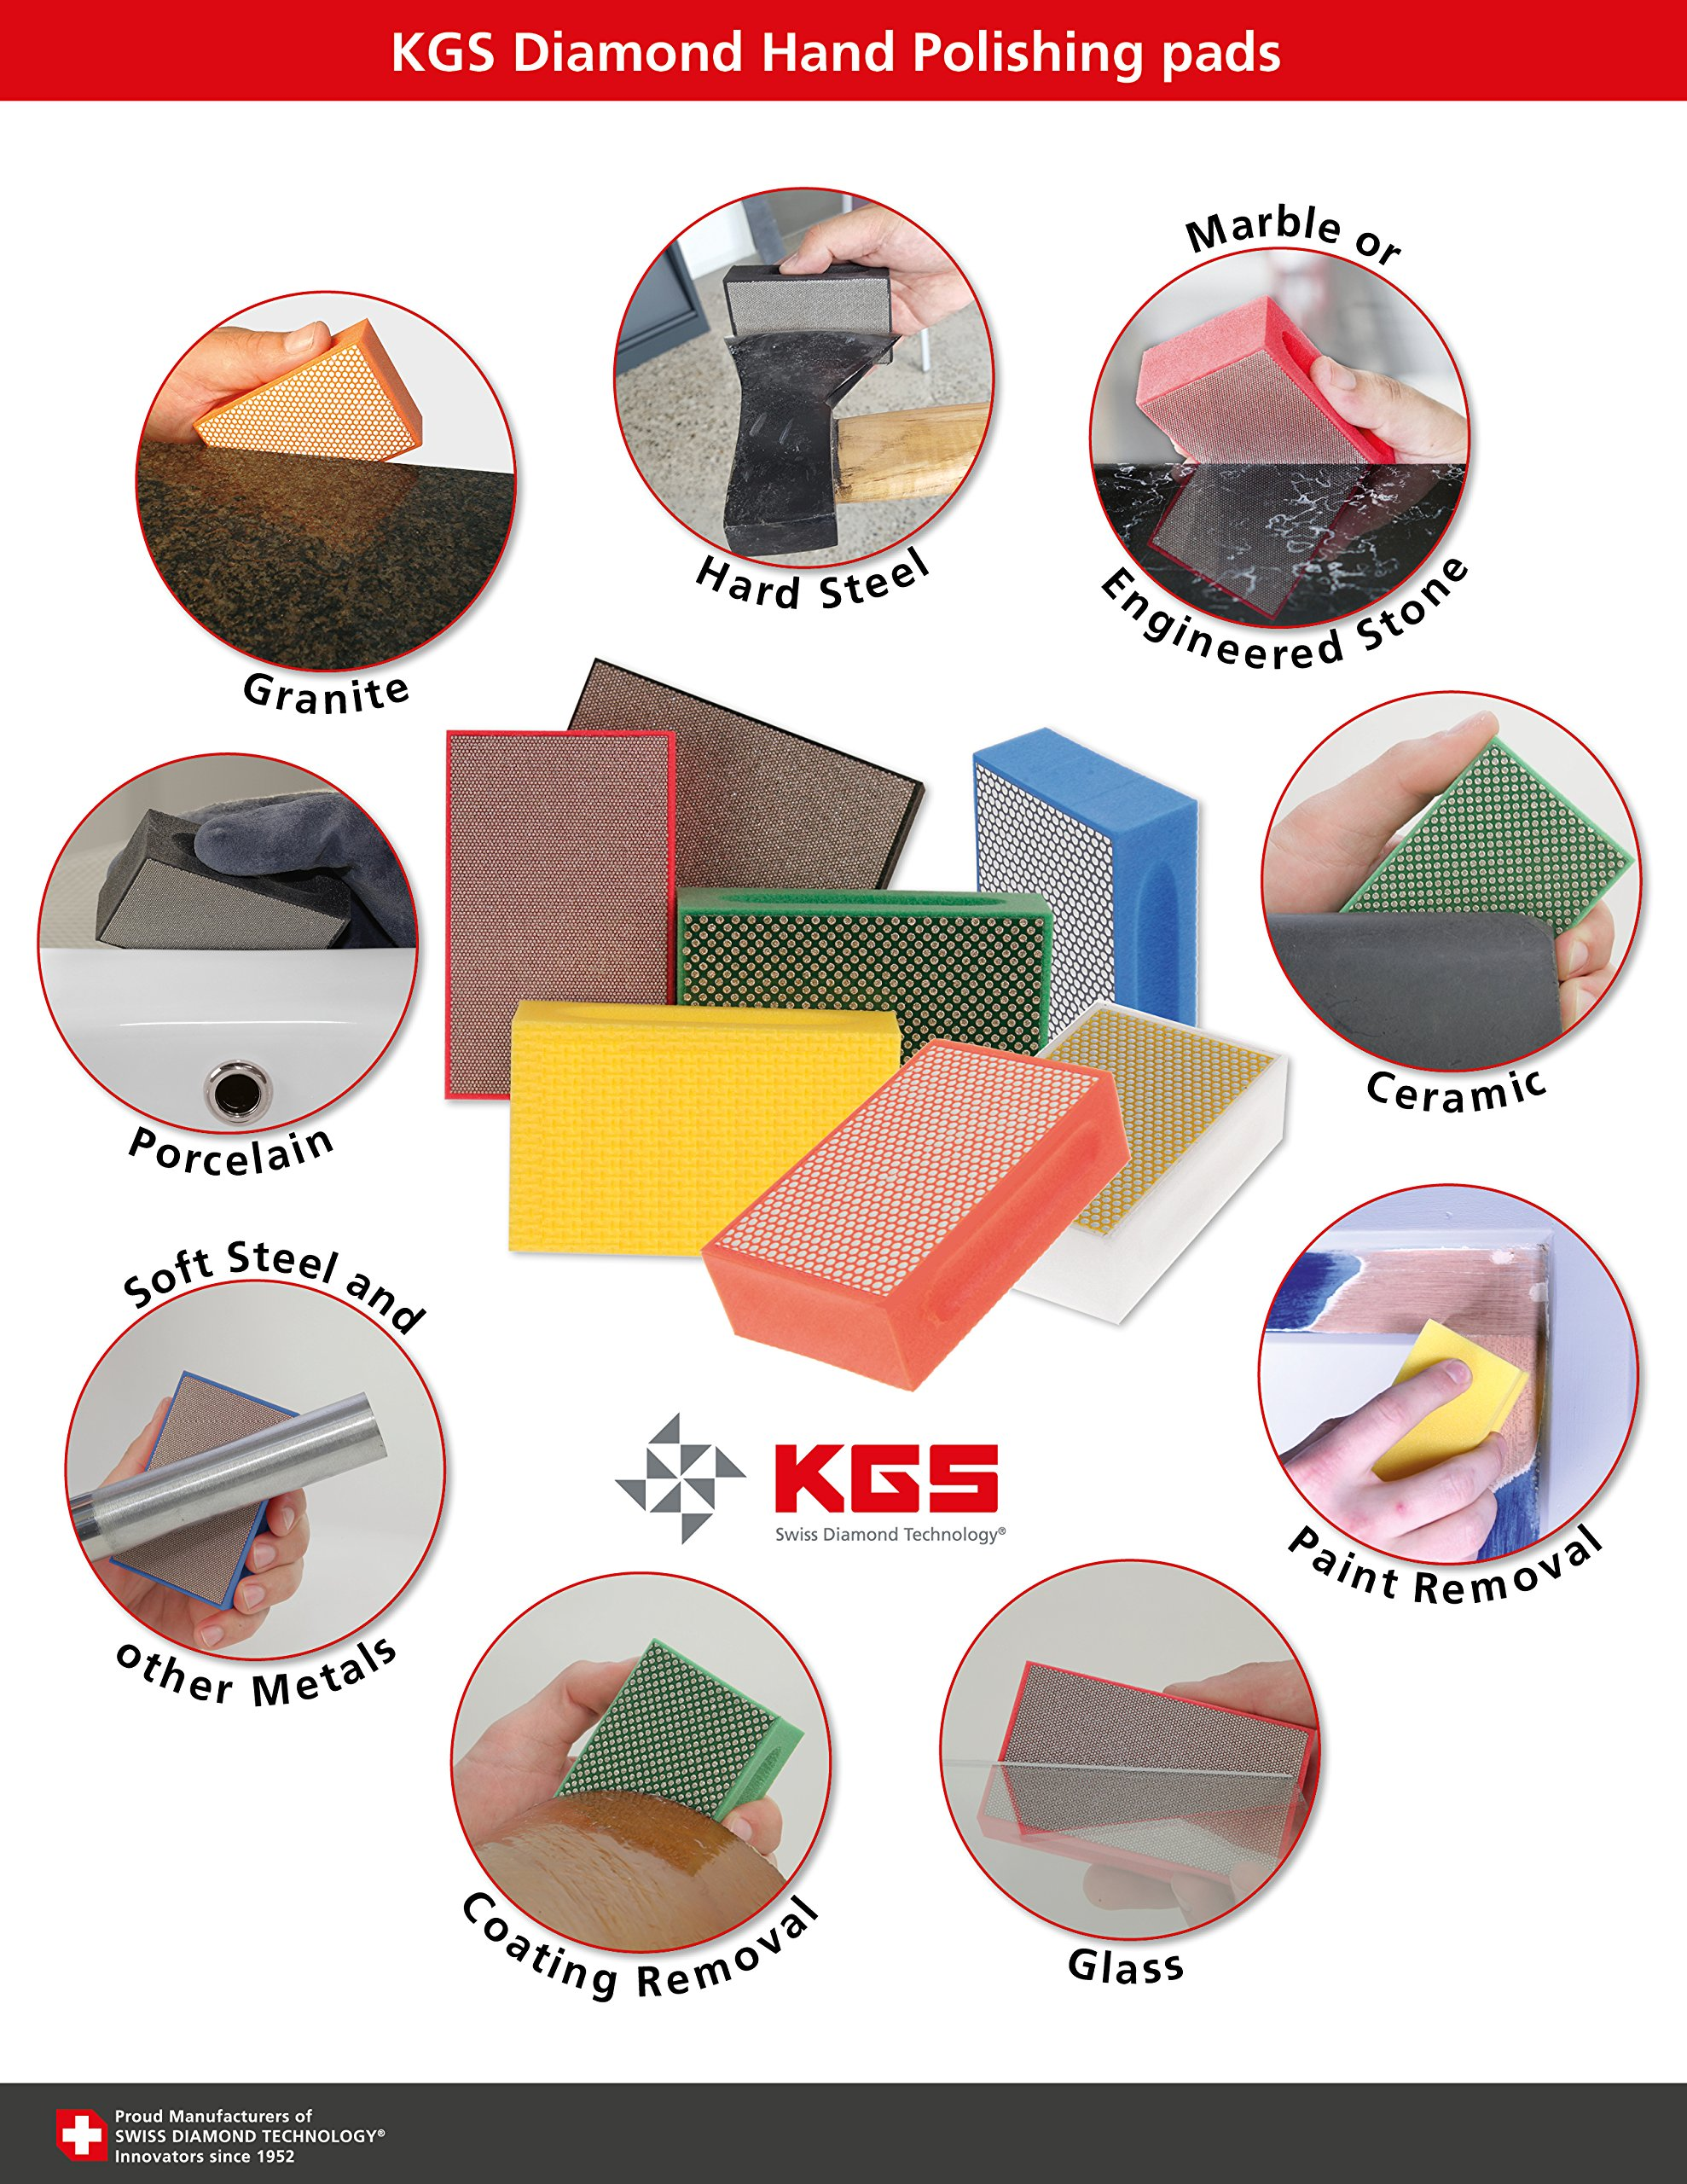 KGS Diamond Hand Polishing pads (3 Pack, Grit 60 (green))